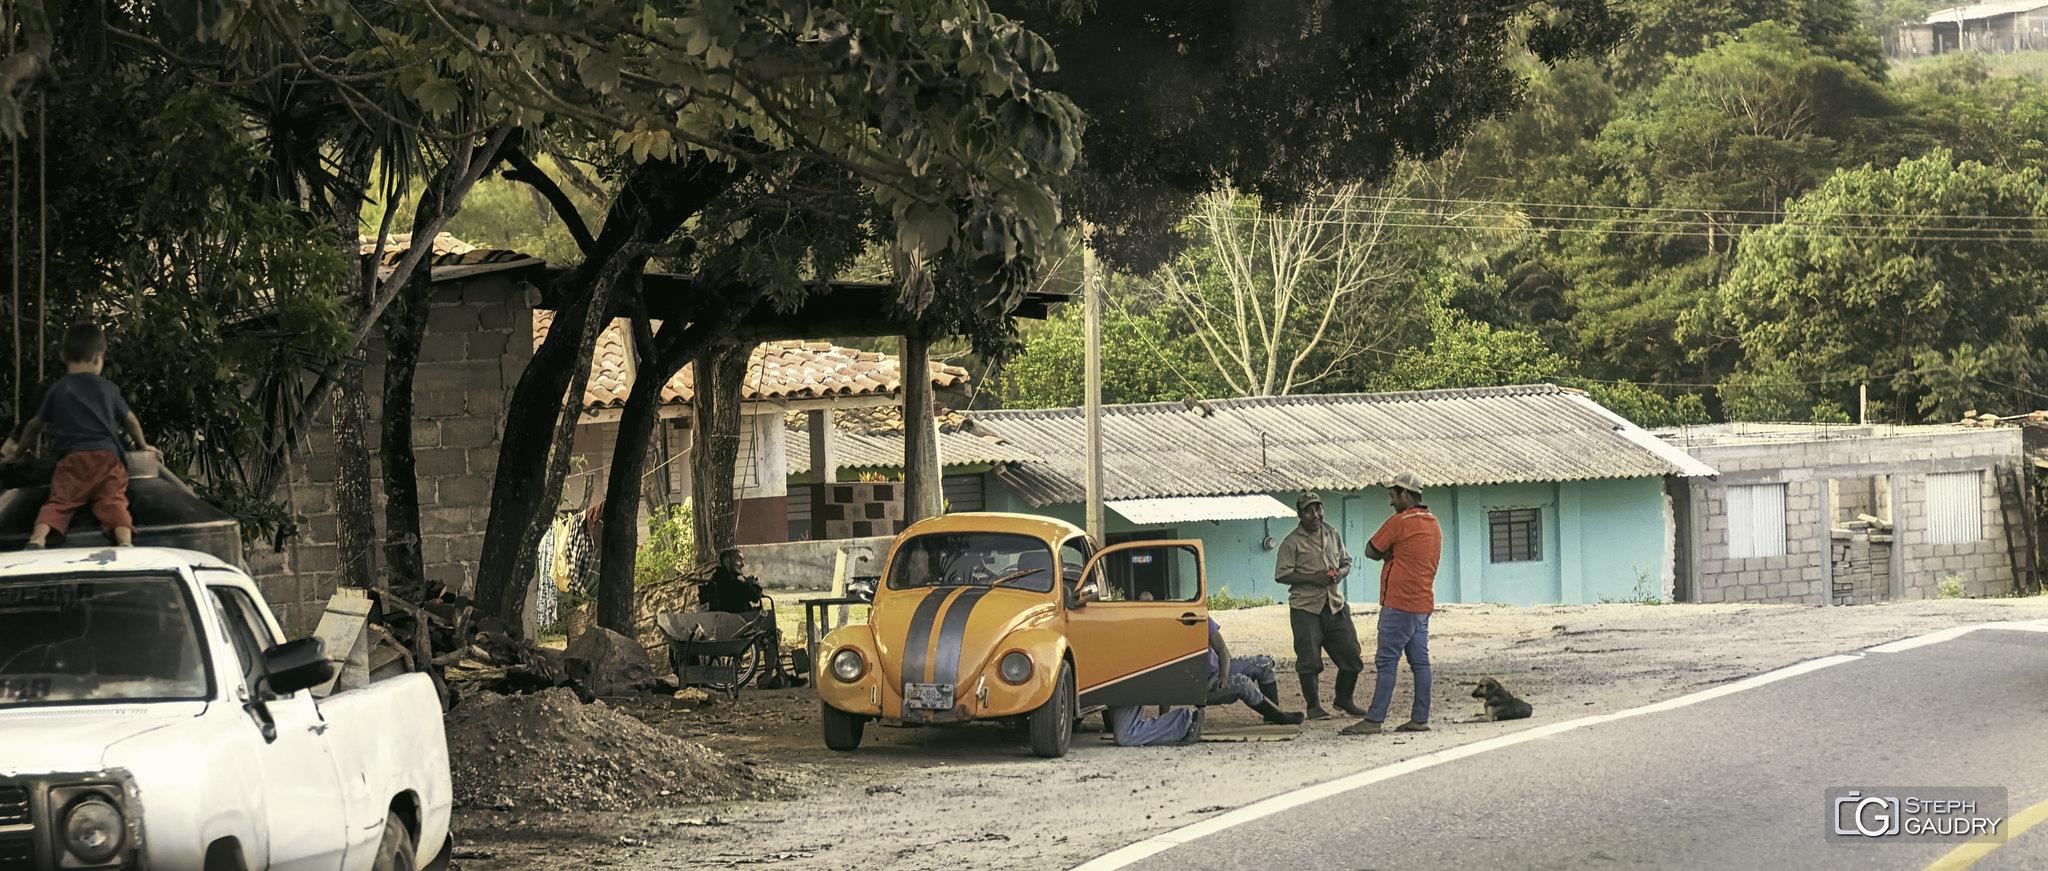 Coccinelle orange le long de la route de Desplayado (MEX) [Klik om de diavoorstelling te starten]